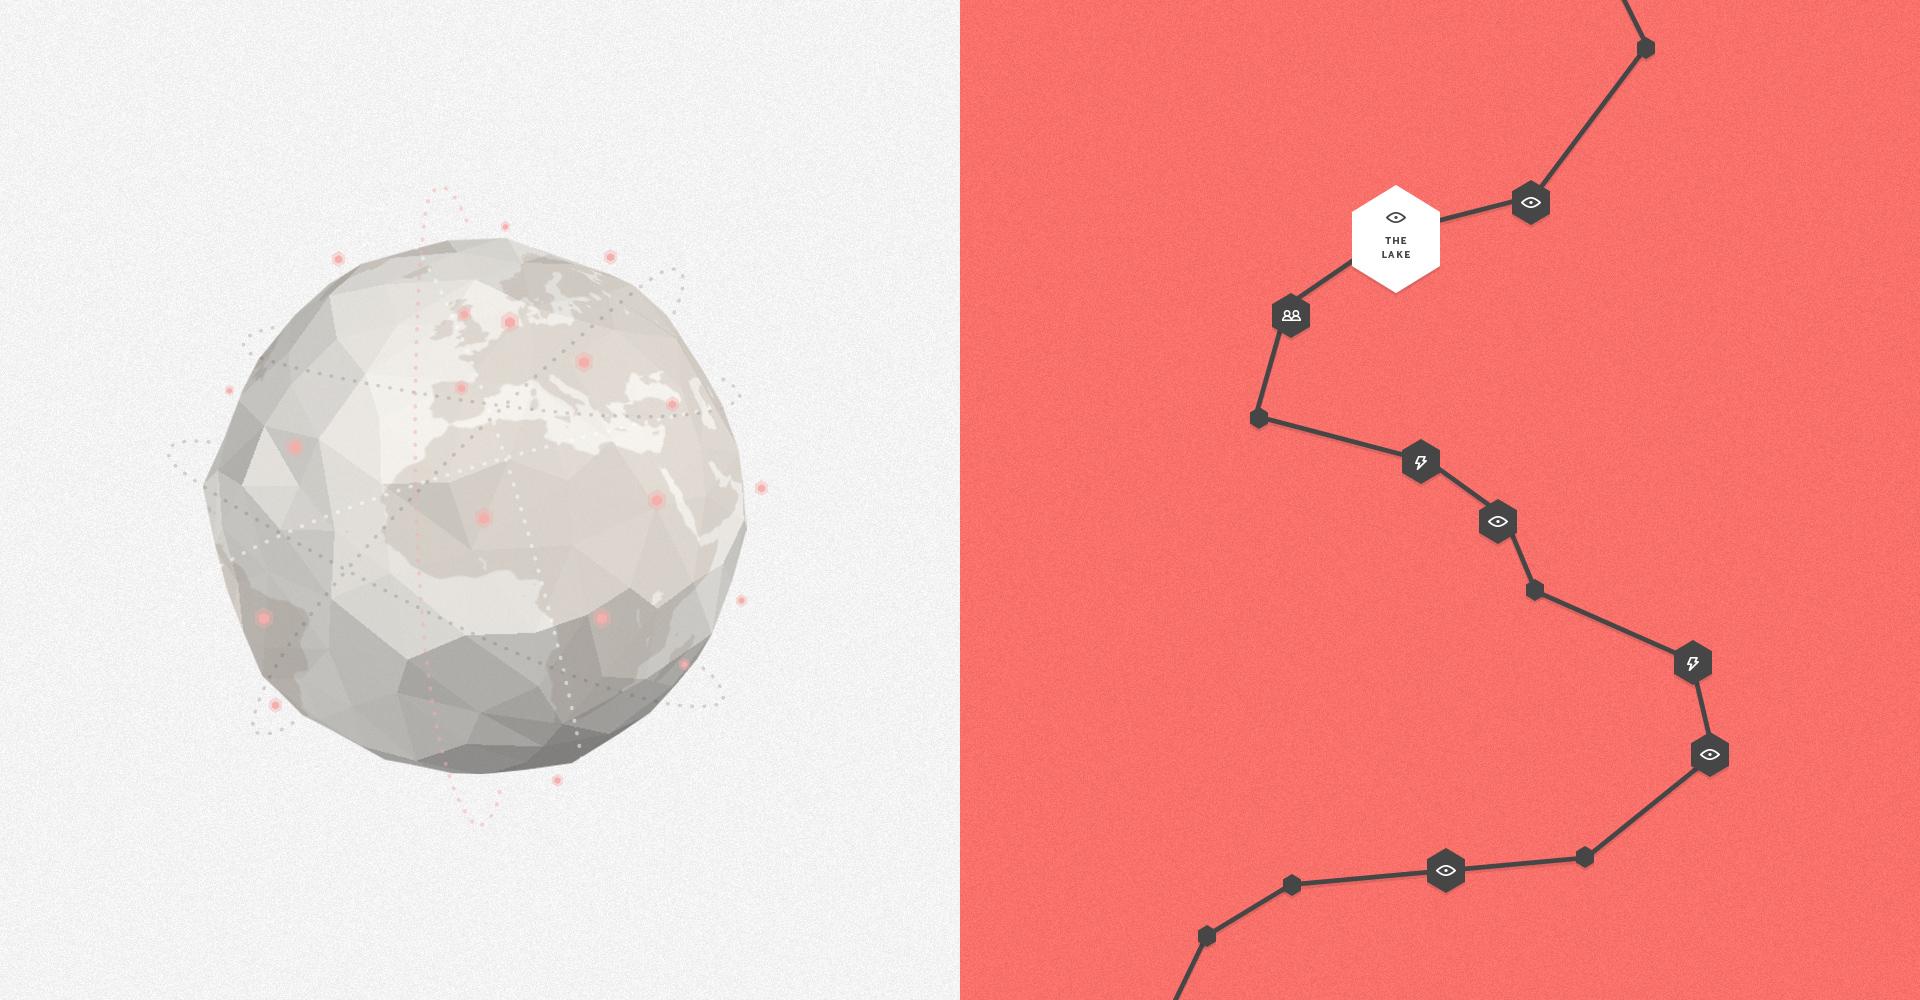 helene-chataigner-roam-identity-globe-path-2